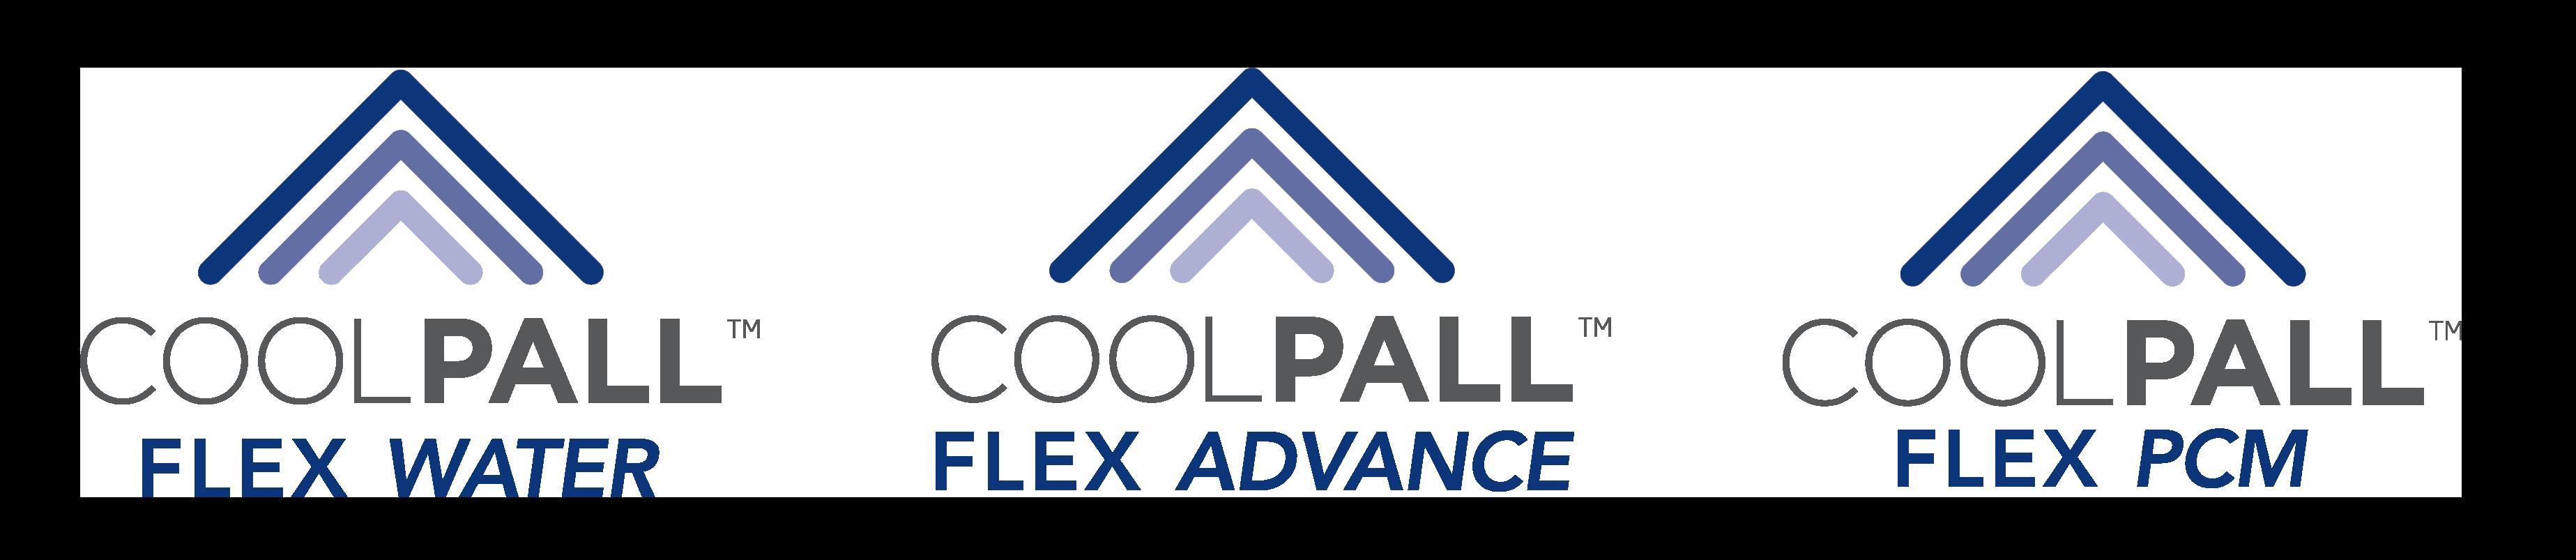 Coolpall Flex Advance Logos